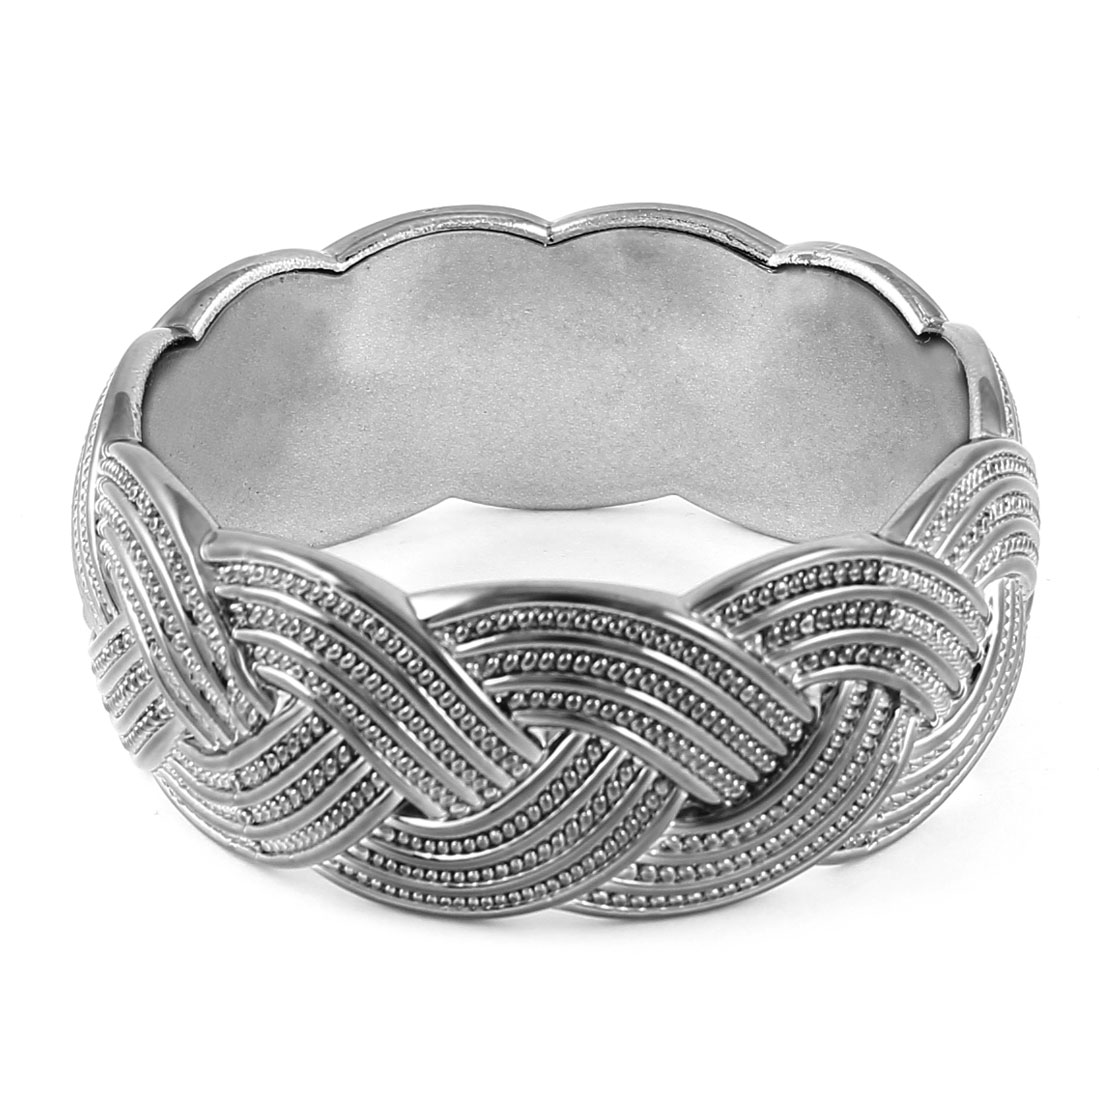 Woman Steel Gray Plastic Braid Pattern Bracelet Wrist Ornament